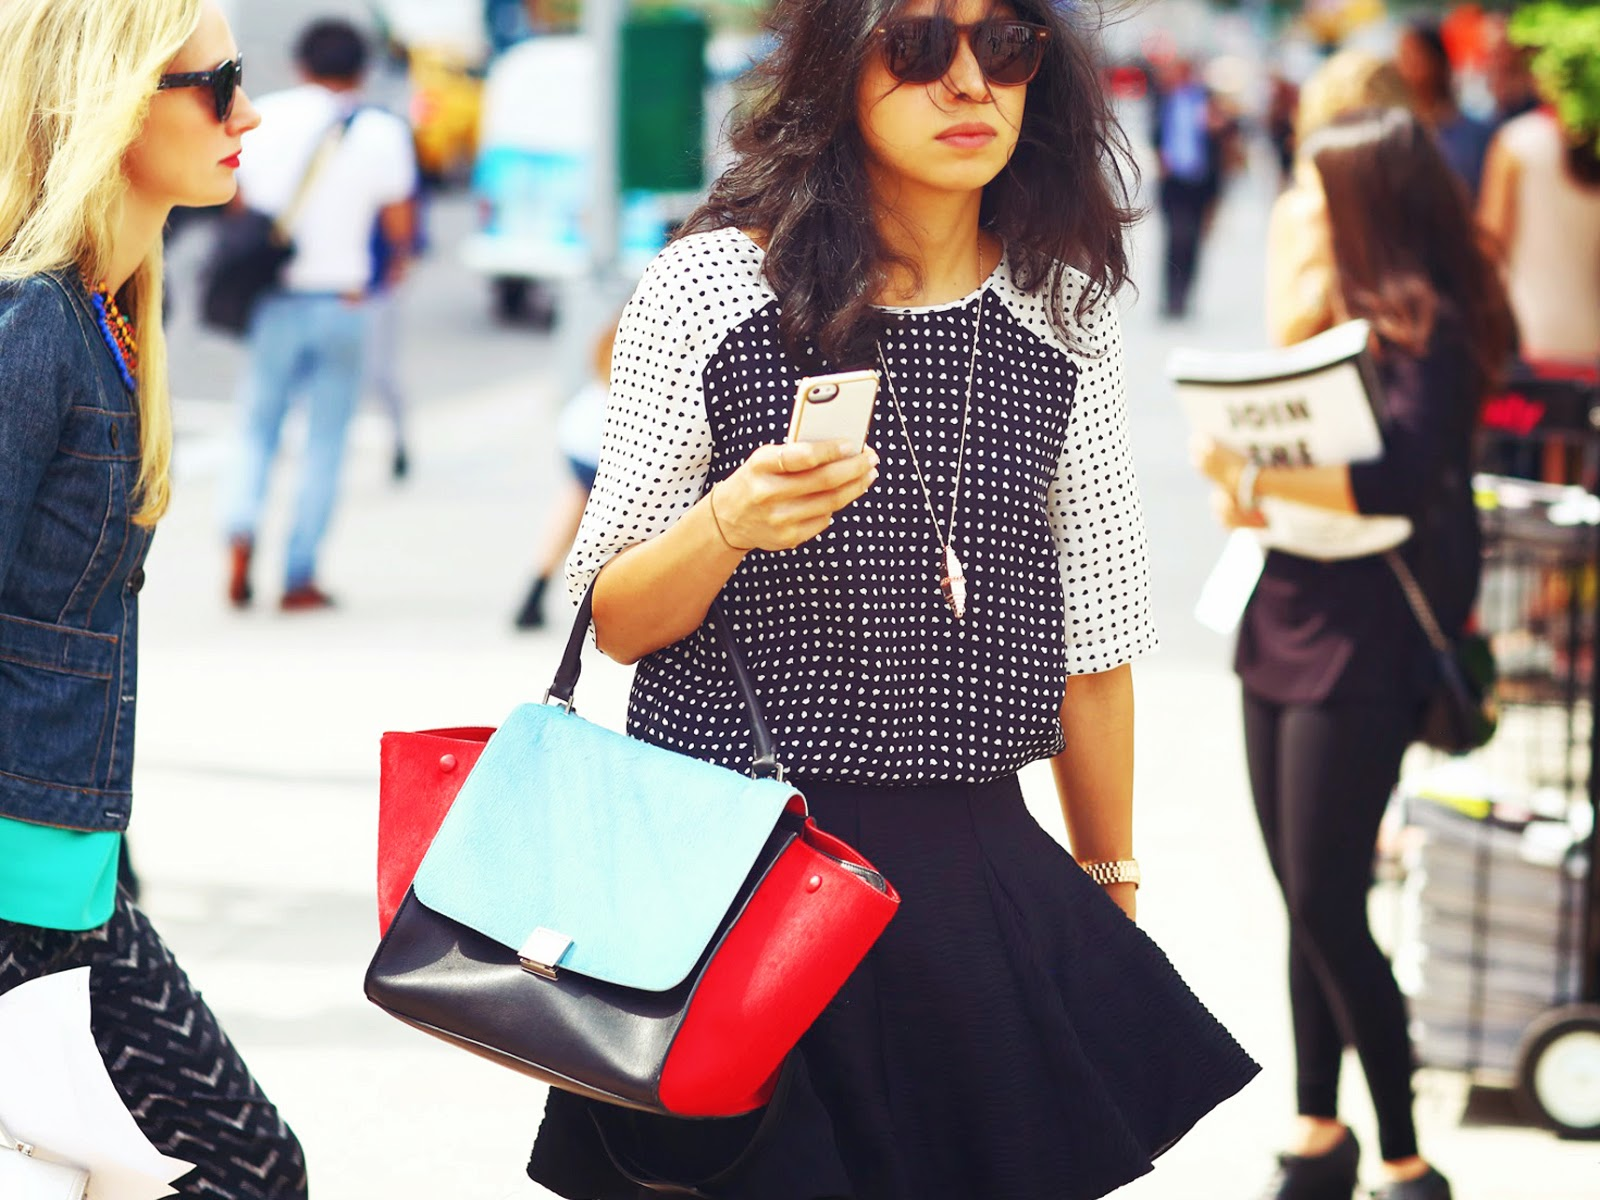 Types of bags: Trapece - Tipos de carteras: Trapecio